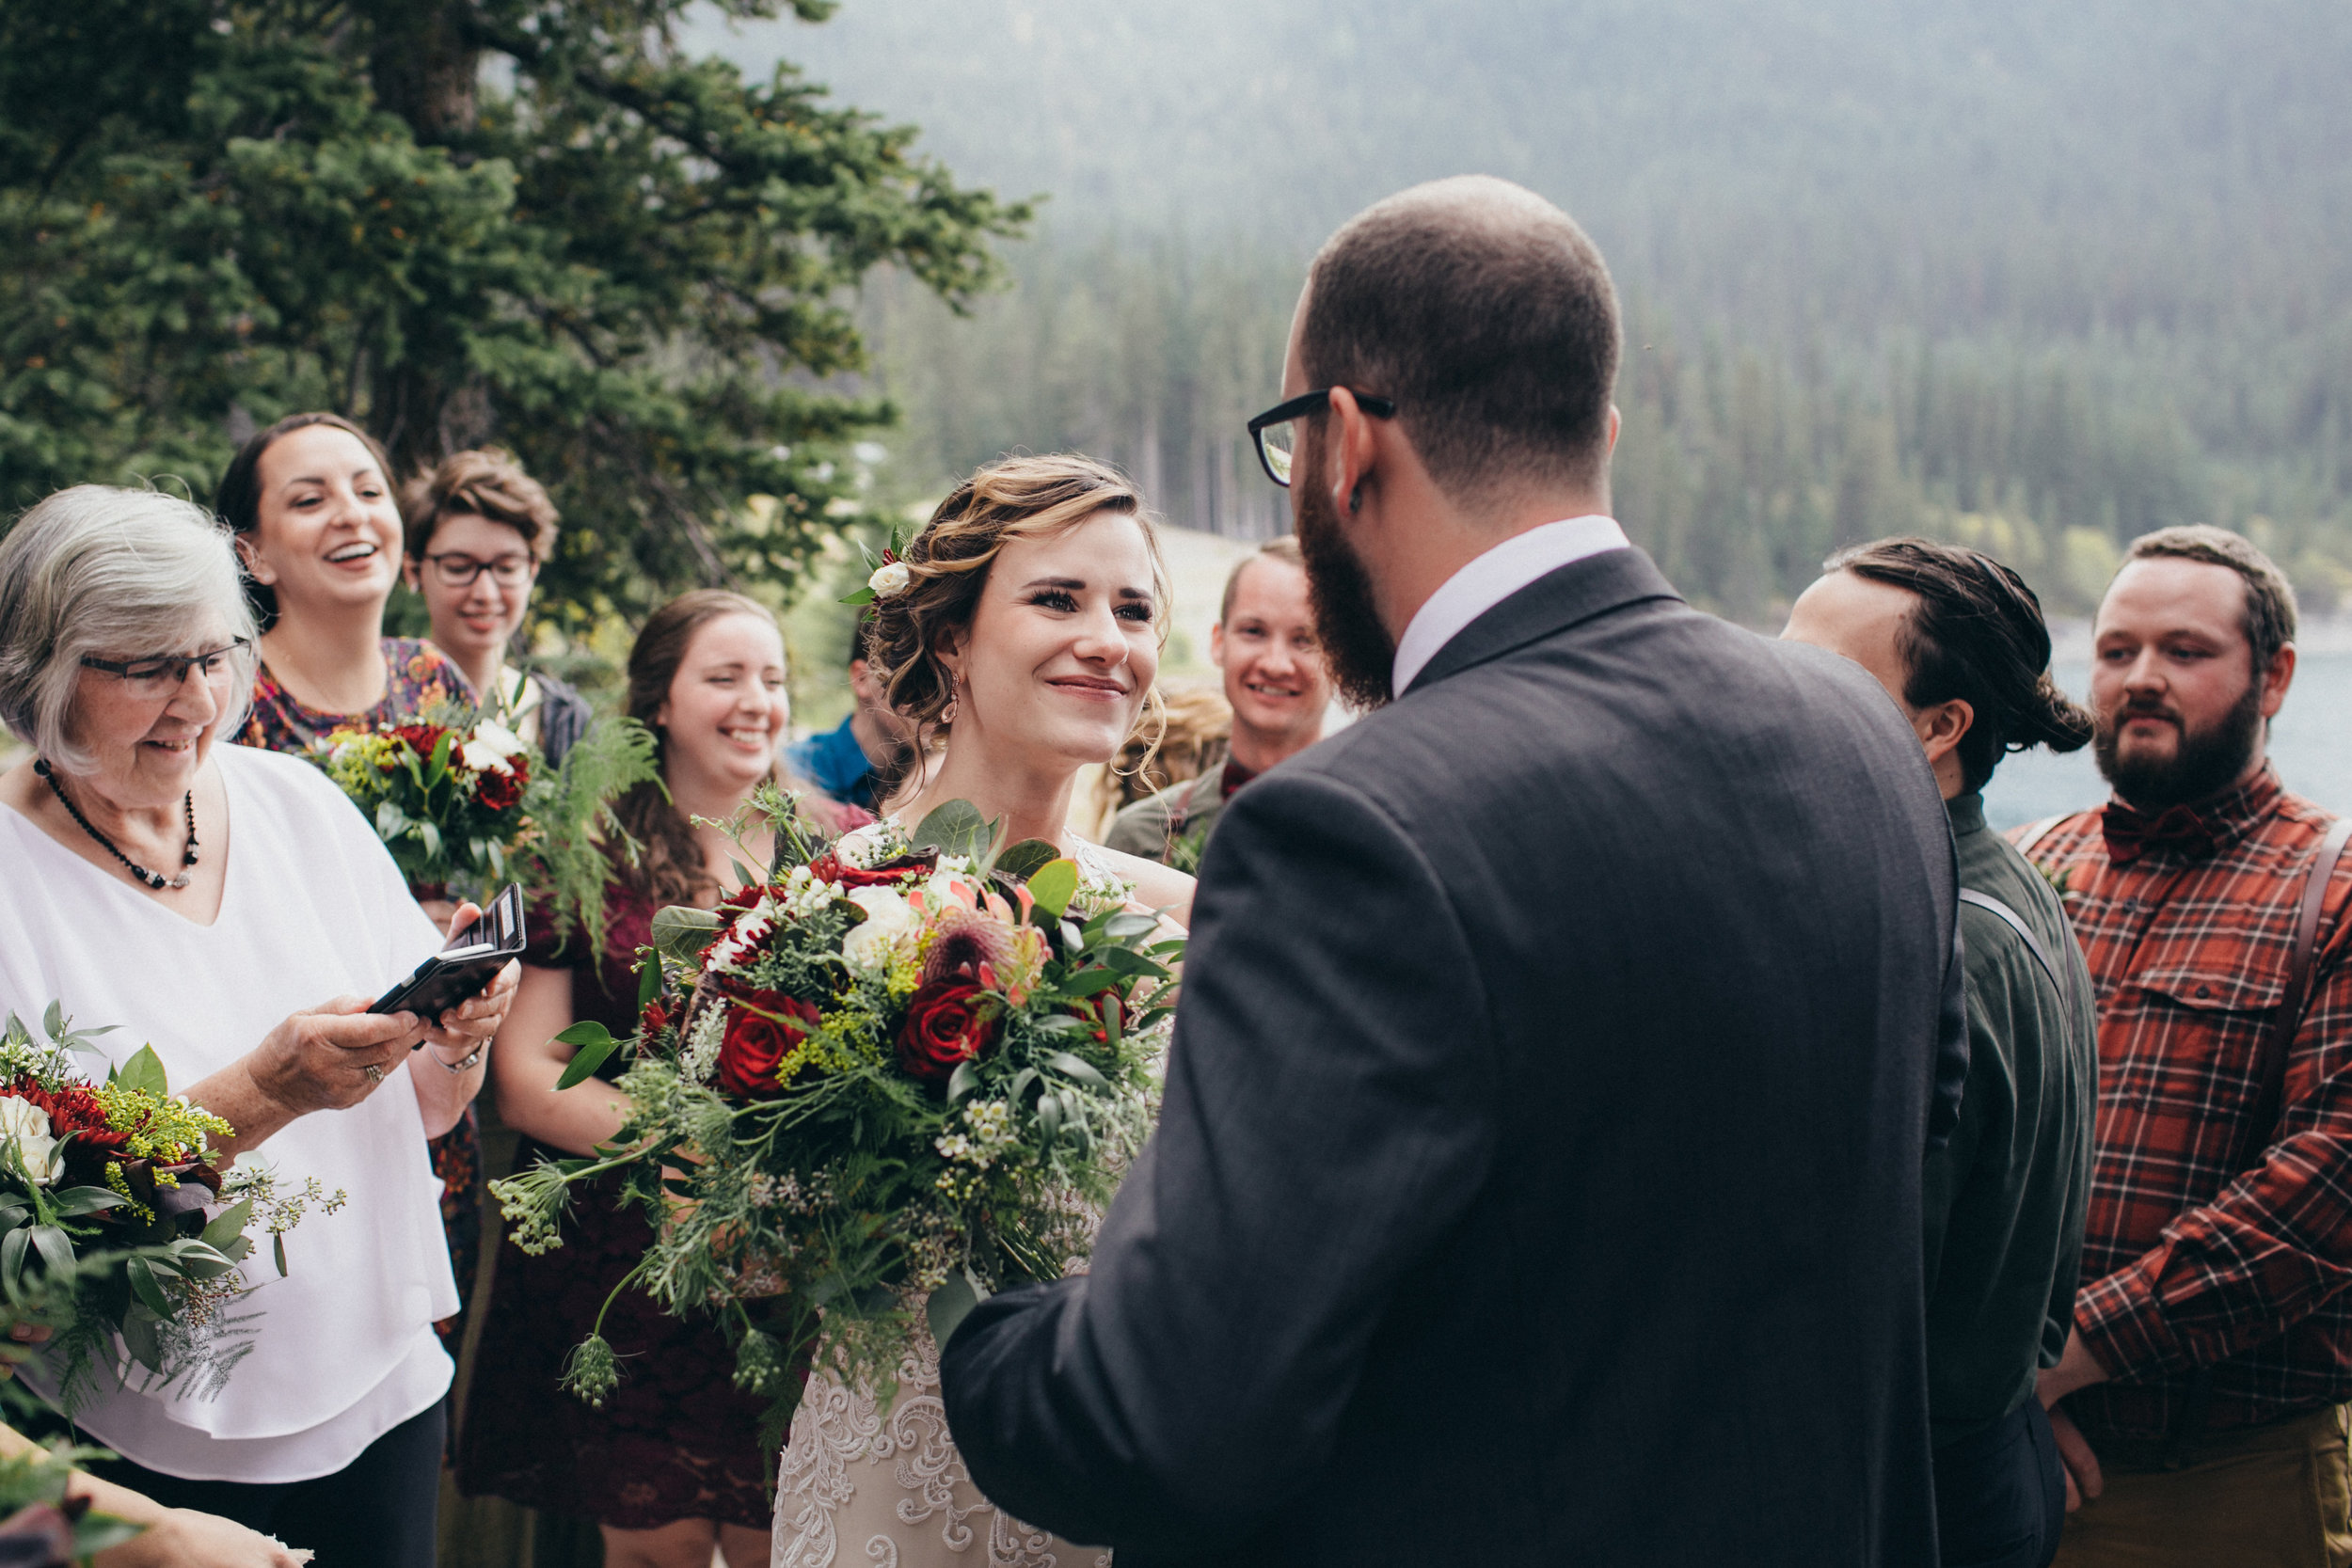 affordable florist based in calgary making wedding flowers